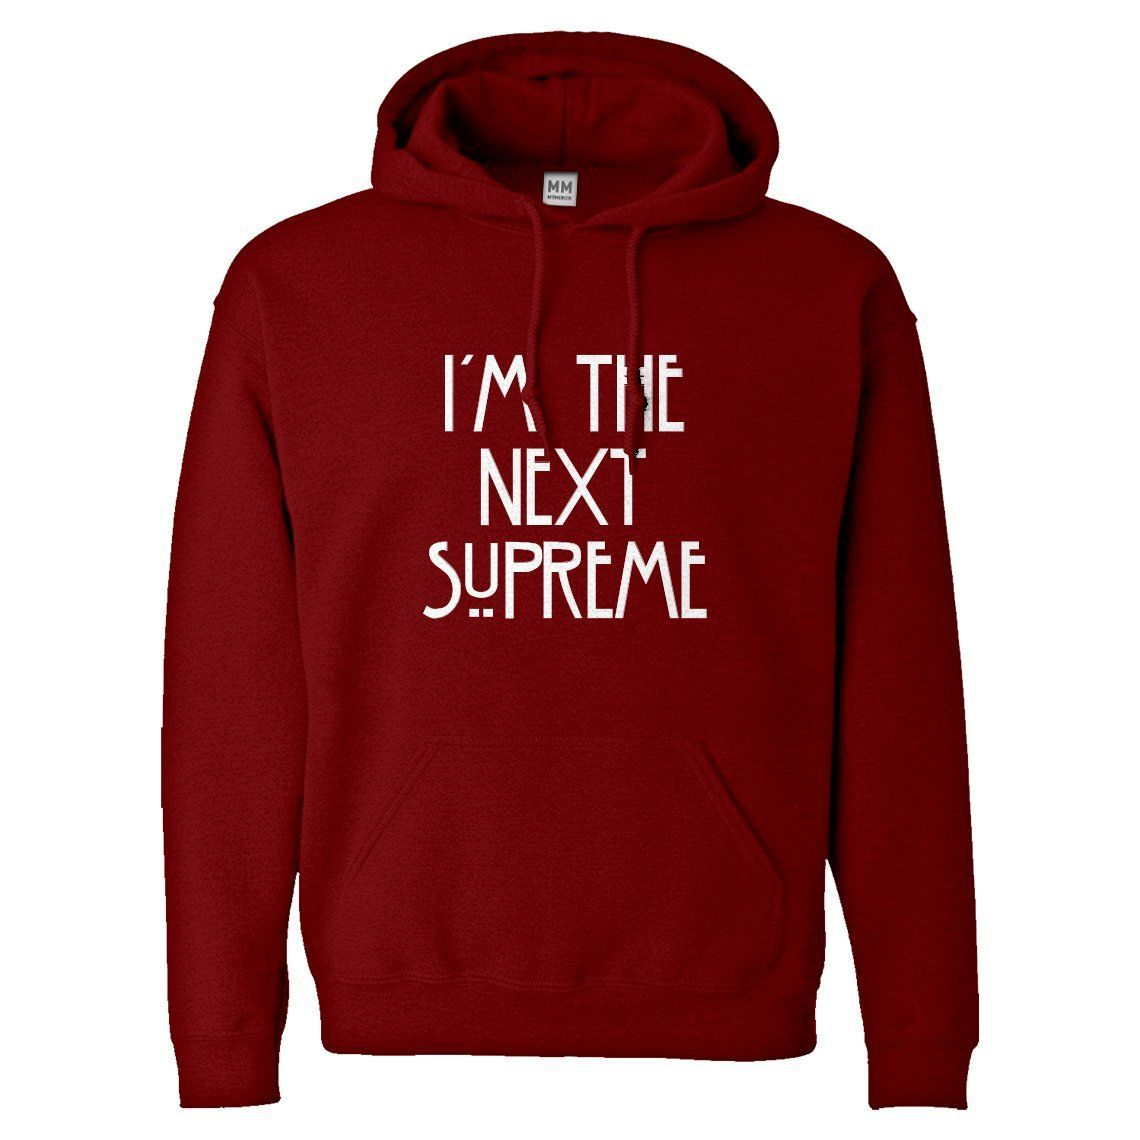 Hoodie I'm the Next Supreme Unisex Hooded Sweatshirt